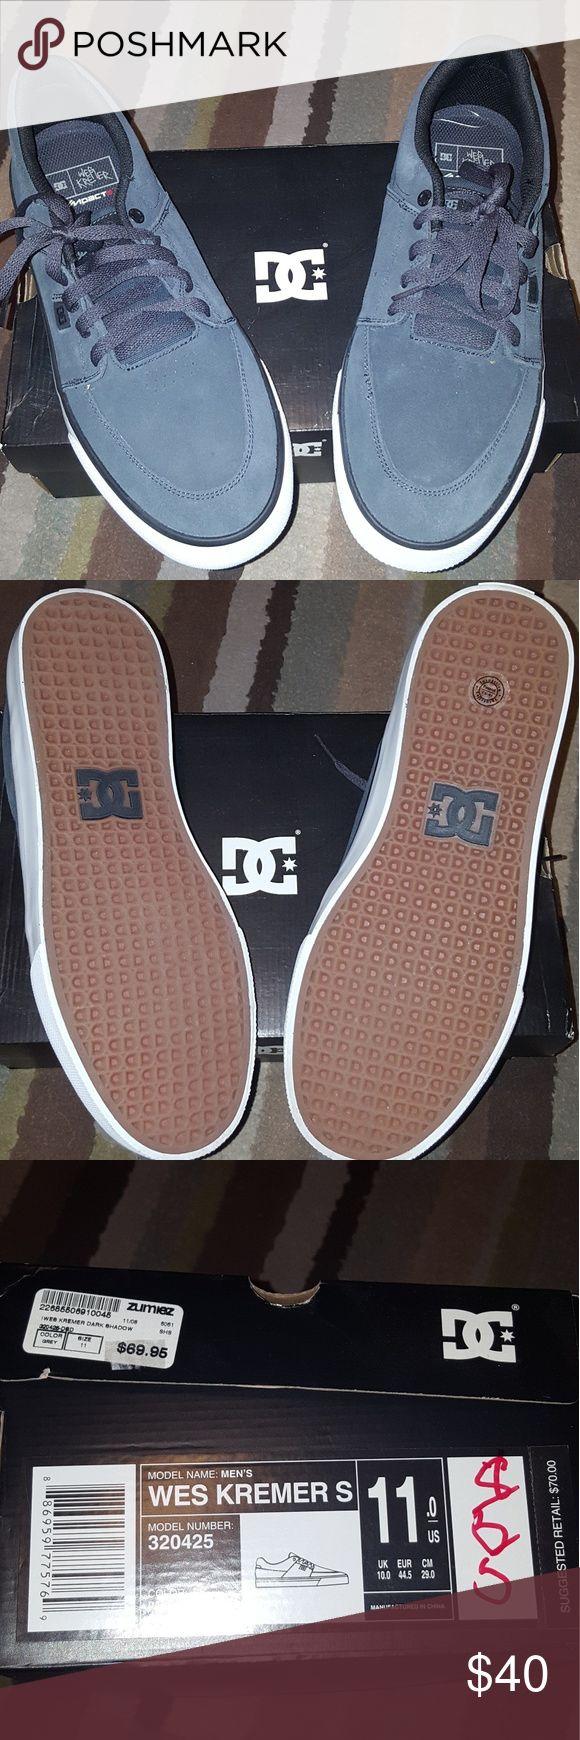 Brand New Men's DC Sneakers. Brand new men's navy blue DC sneakers in size 11. DC Shoes Sneakers